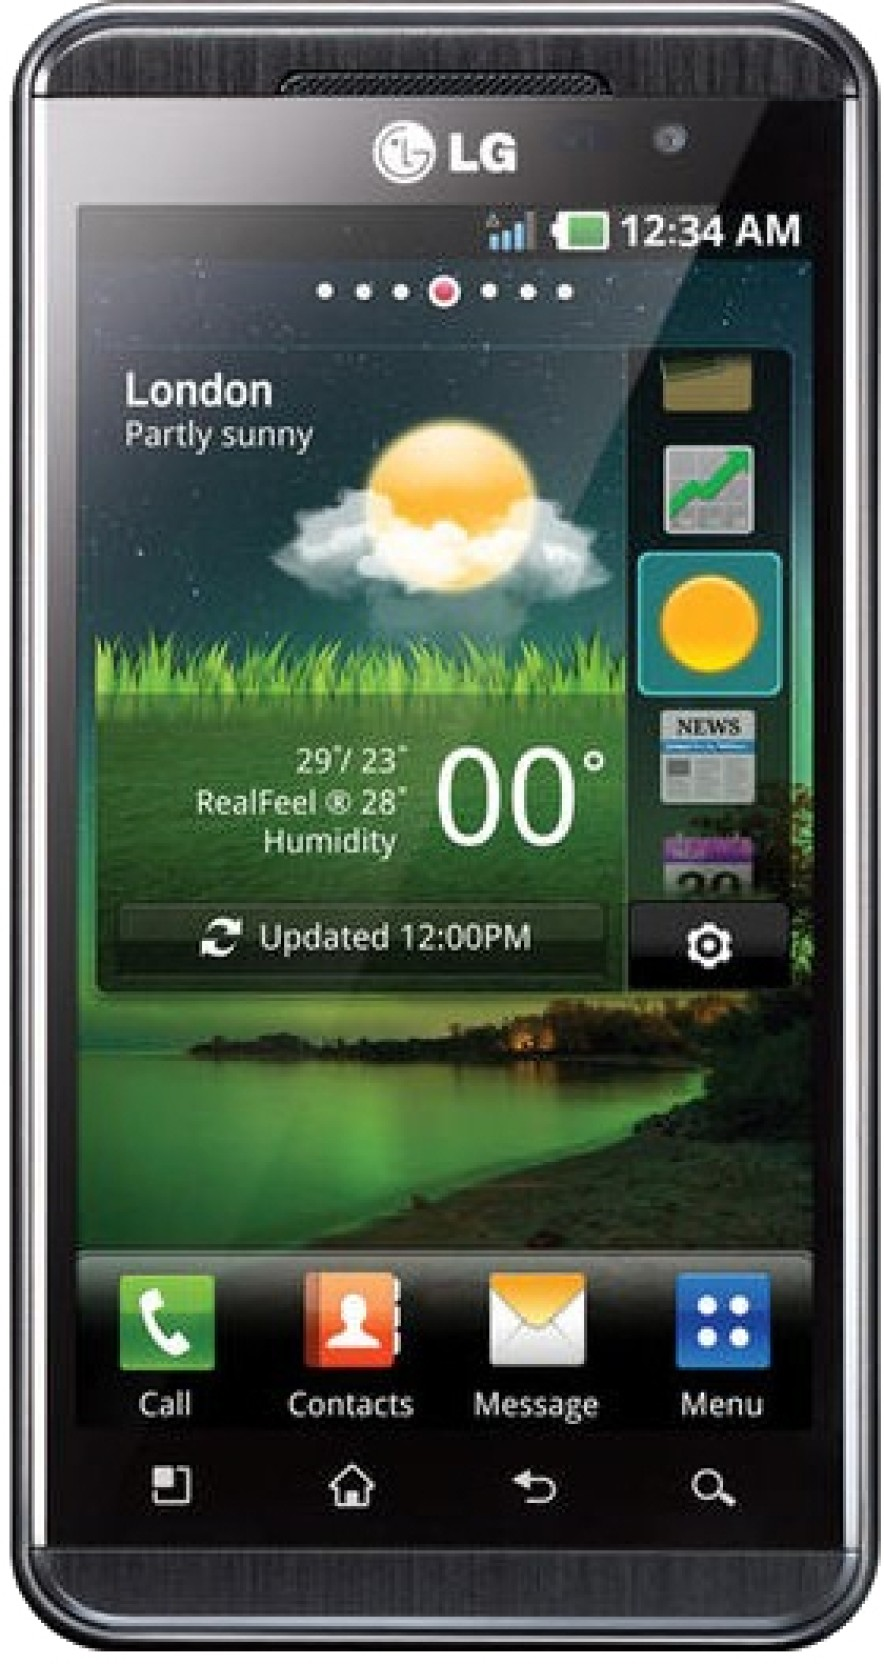 Lg Optimus 3d P920 Metal Black 8 Gb Online At Best Price Only On Nokia Asha 501 Dual Sim Resmi Bright Red Compare